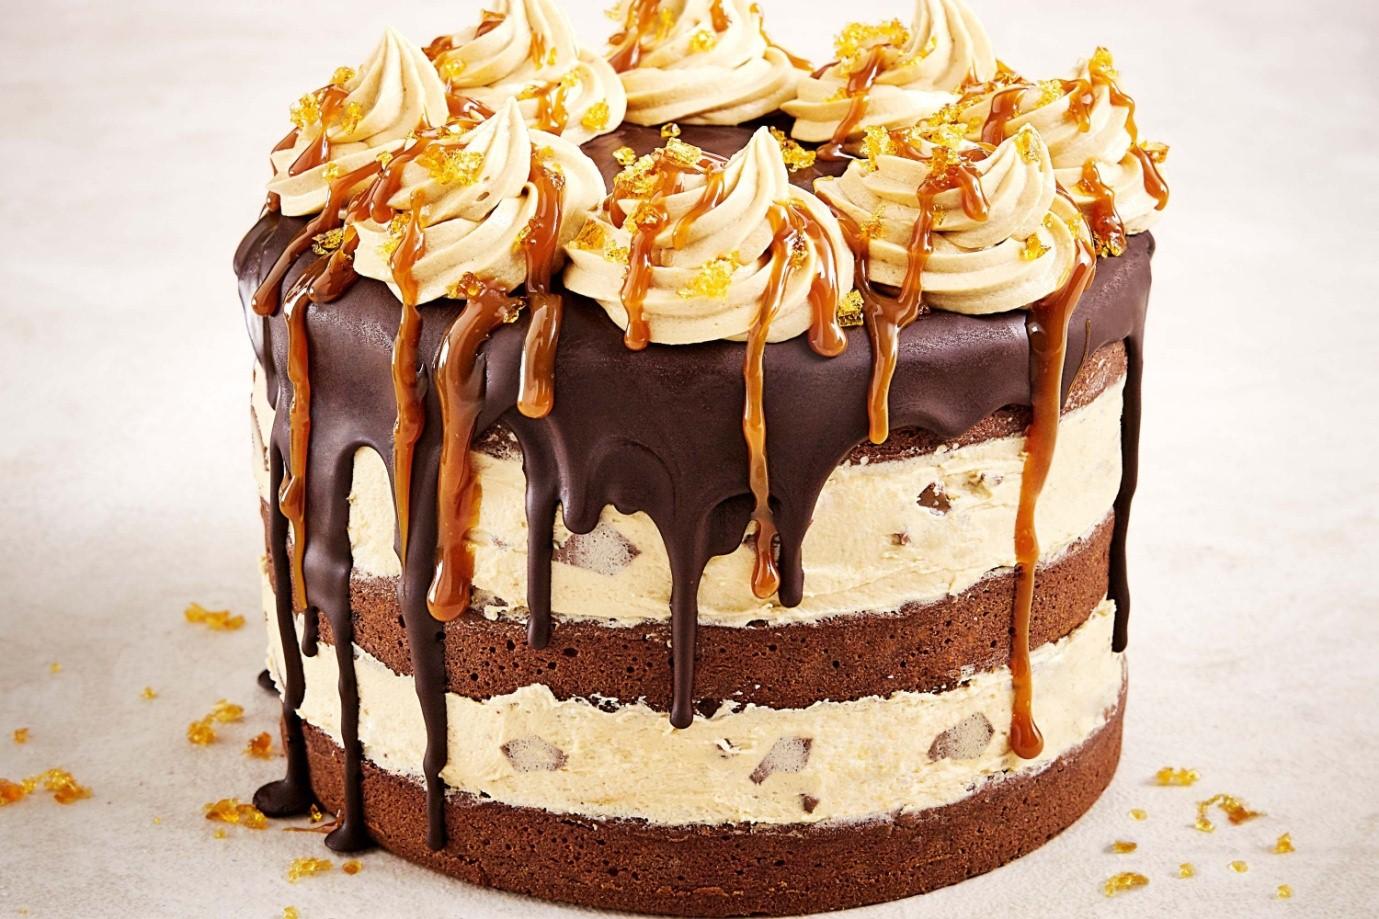 online cake order in Faridabad